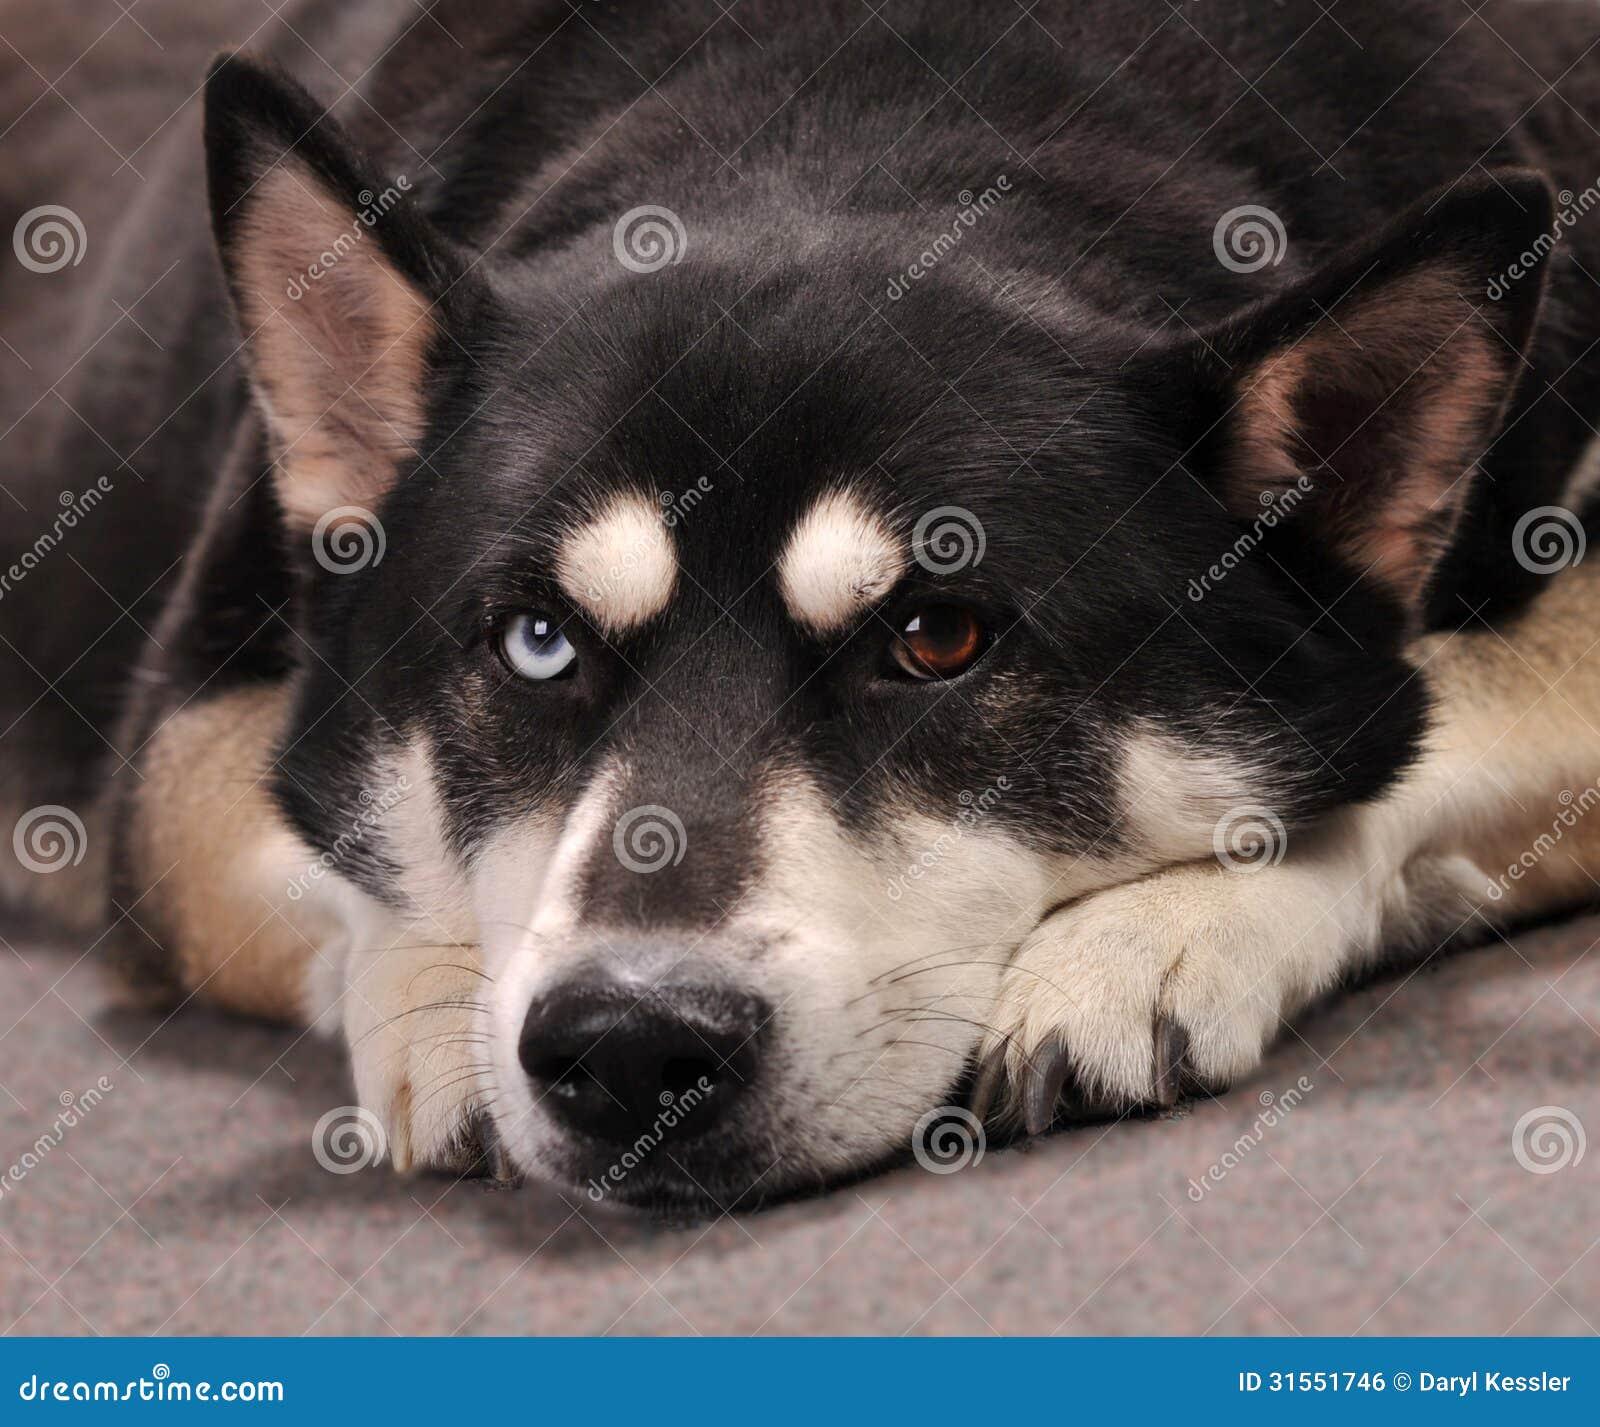 Do It Yourself Home Design: Beautiful German Shepherd Husky Mix Dog Looking Bo Stock